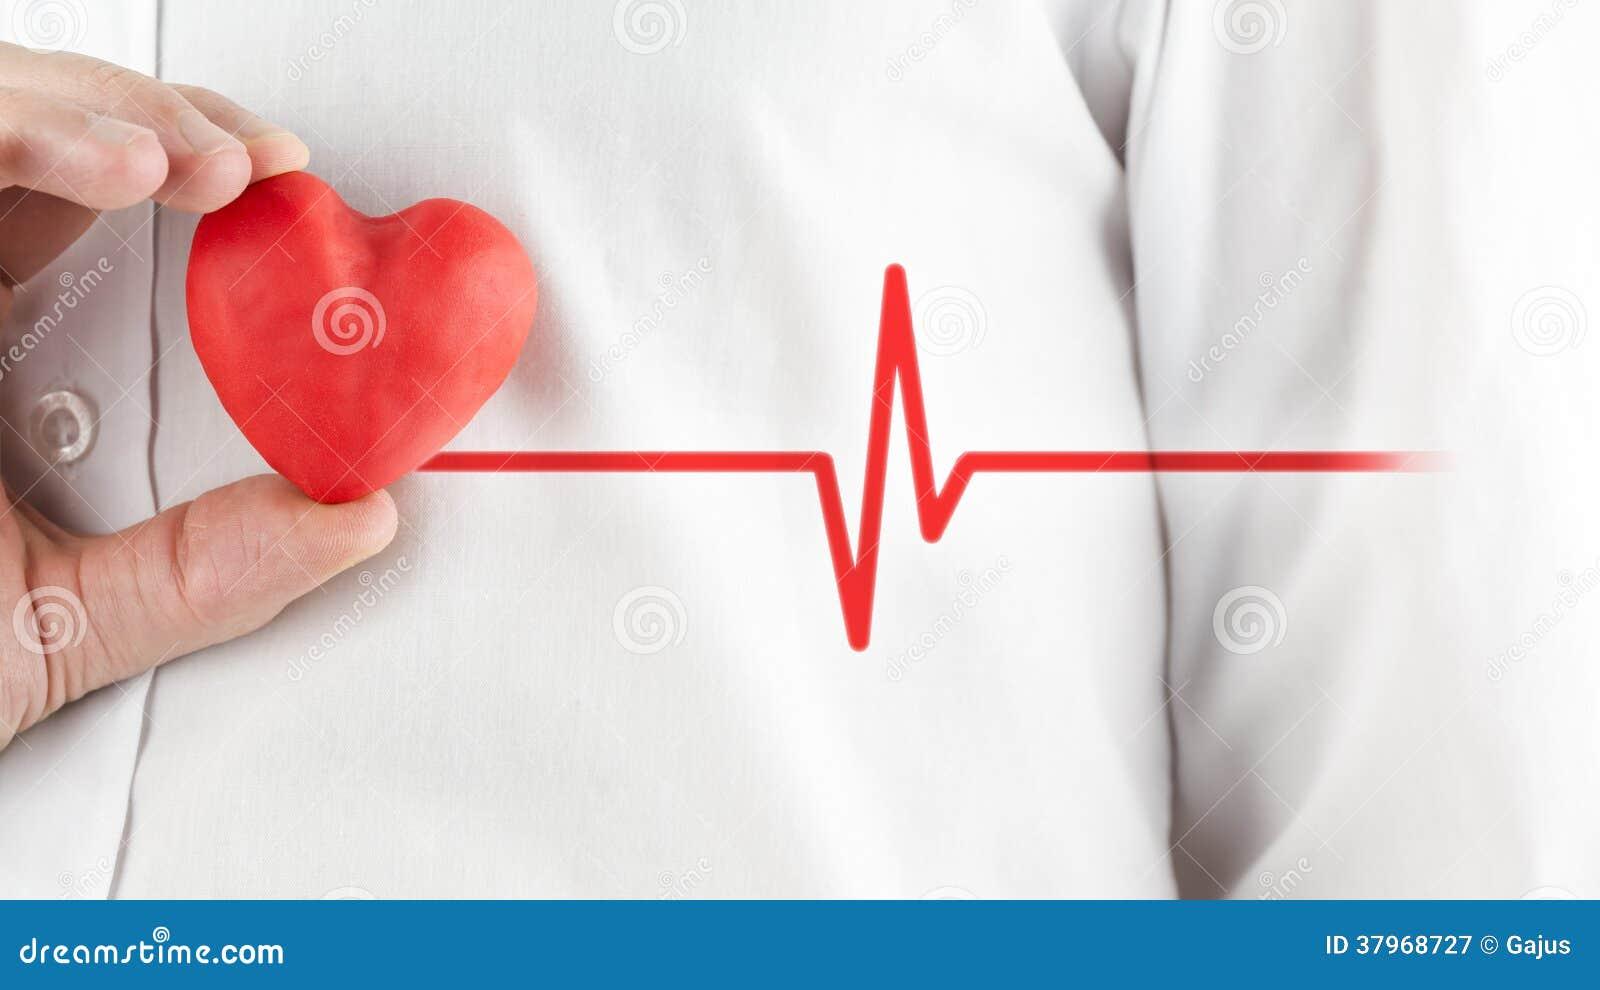 Healthy heart and good health